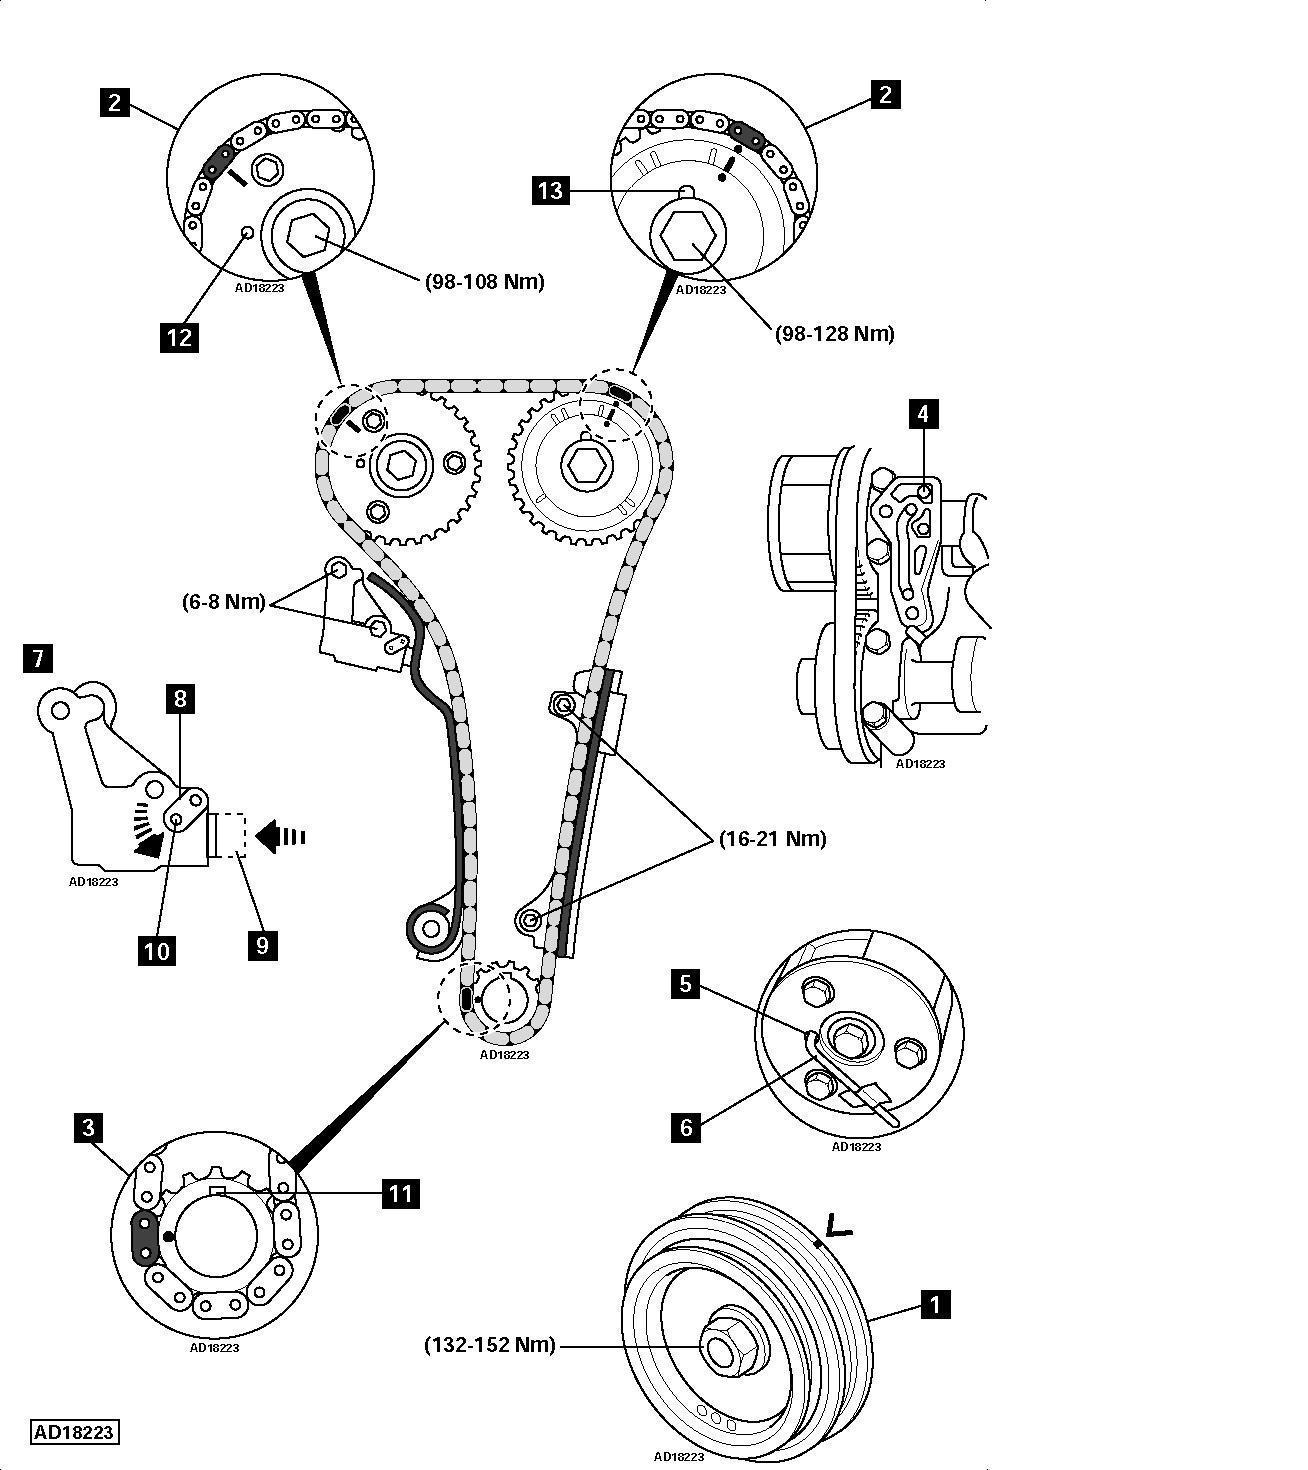 1993 Subaru Legacy Timing Marks Diagram Image Details 1990 Fuse Box